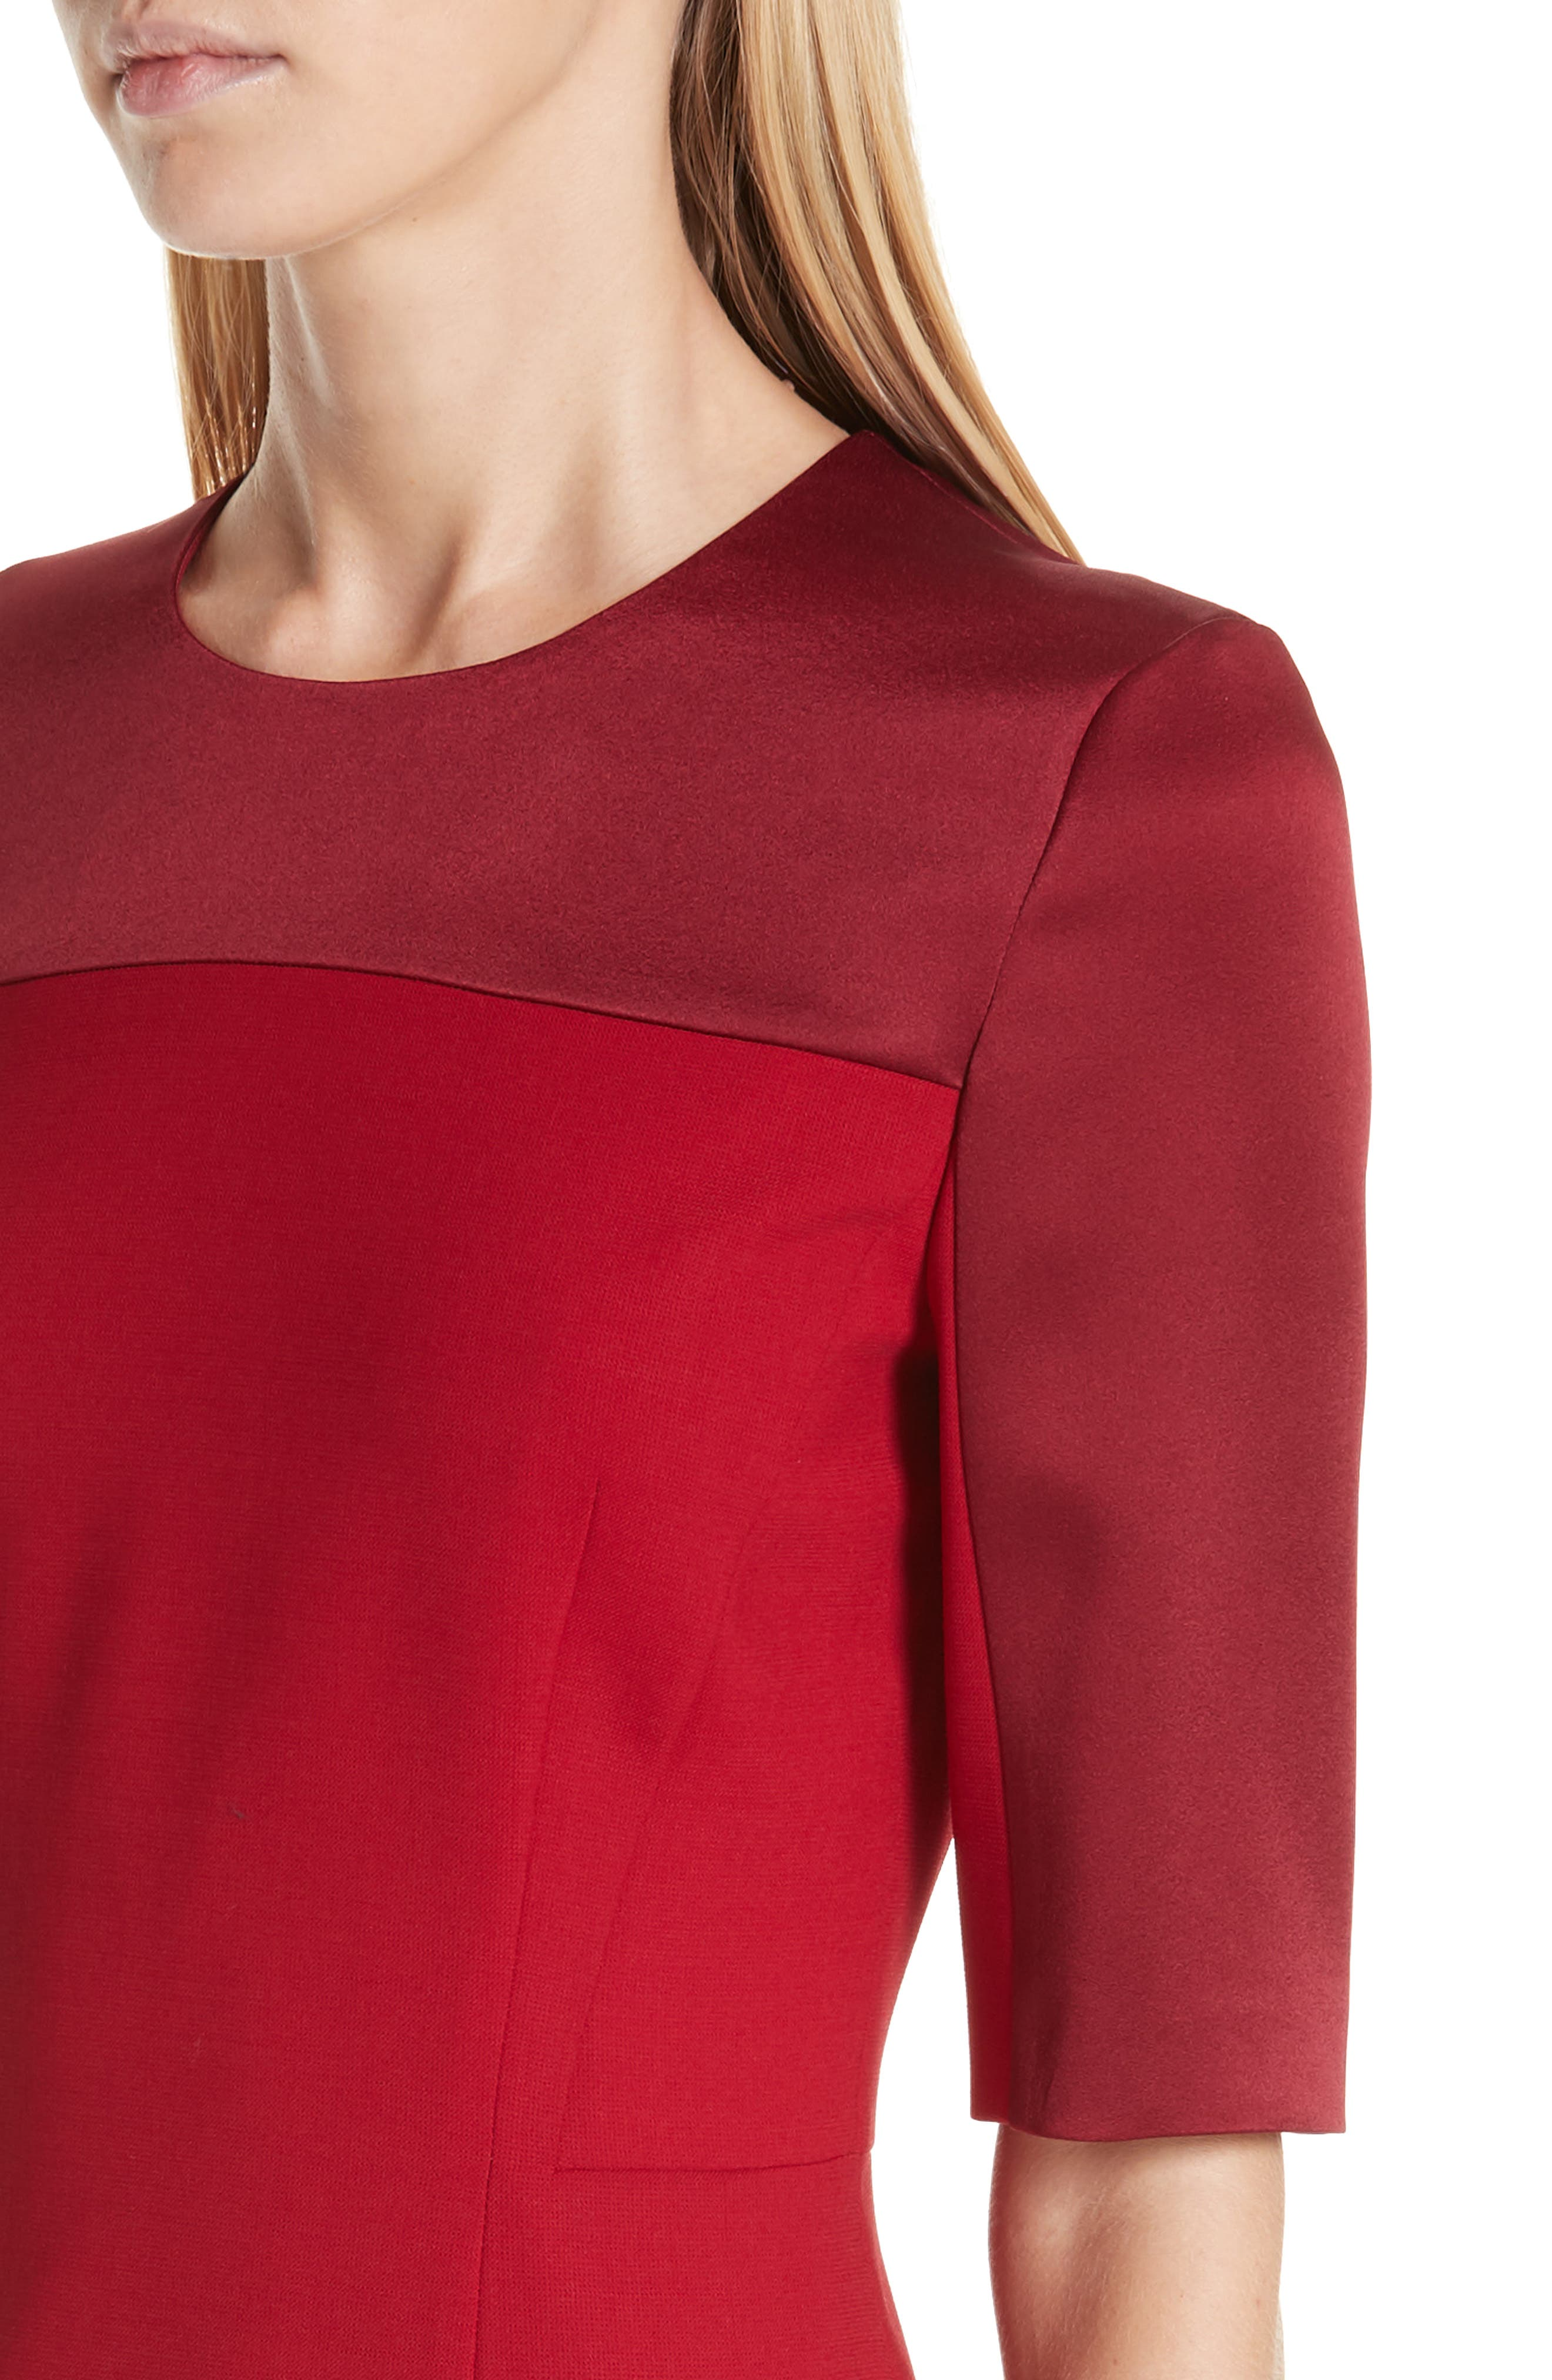 Danufa Stretch Wool Sheath Dress,                             Alternate thumbnail 4, color,                             DARK RED